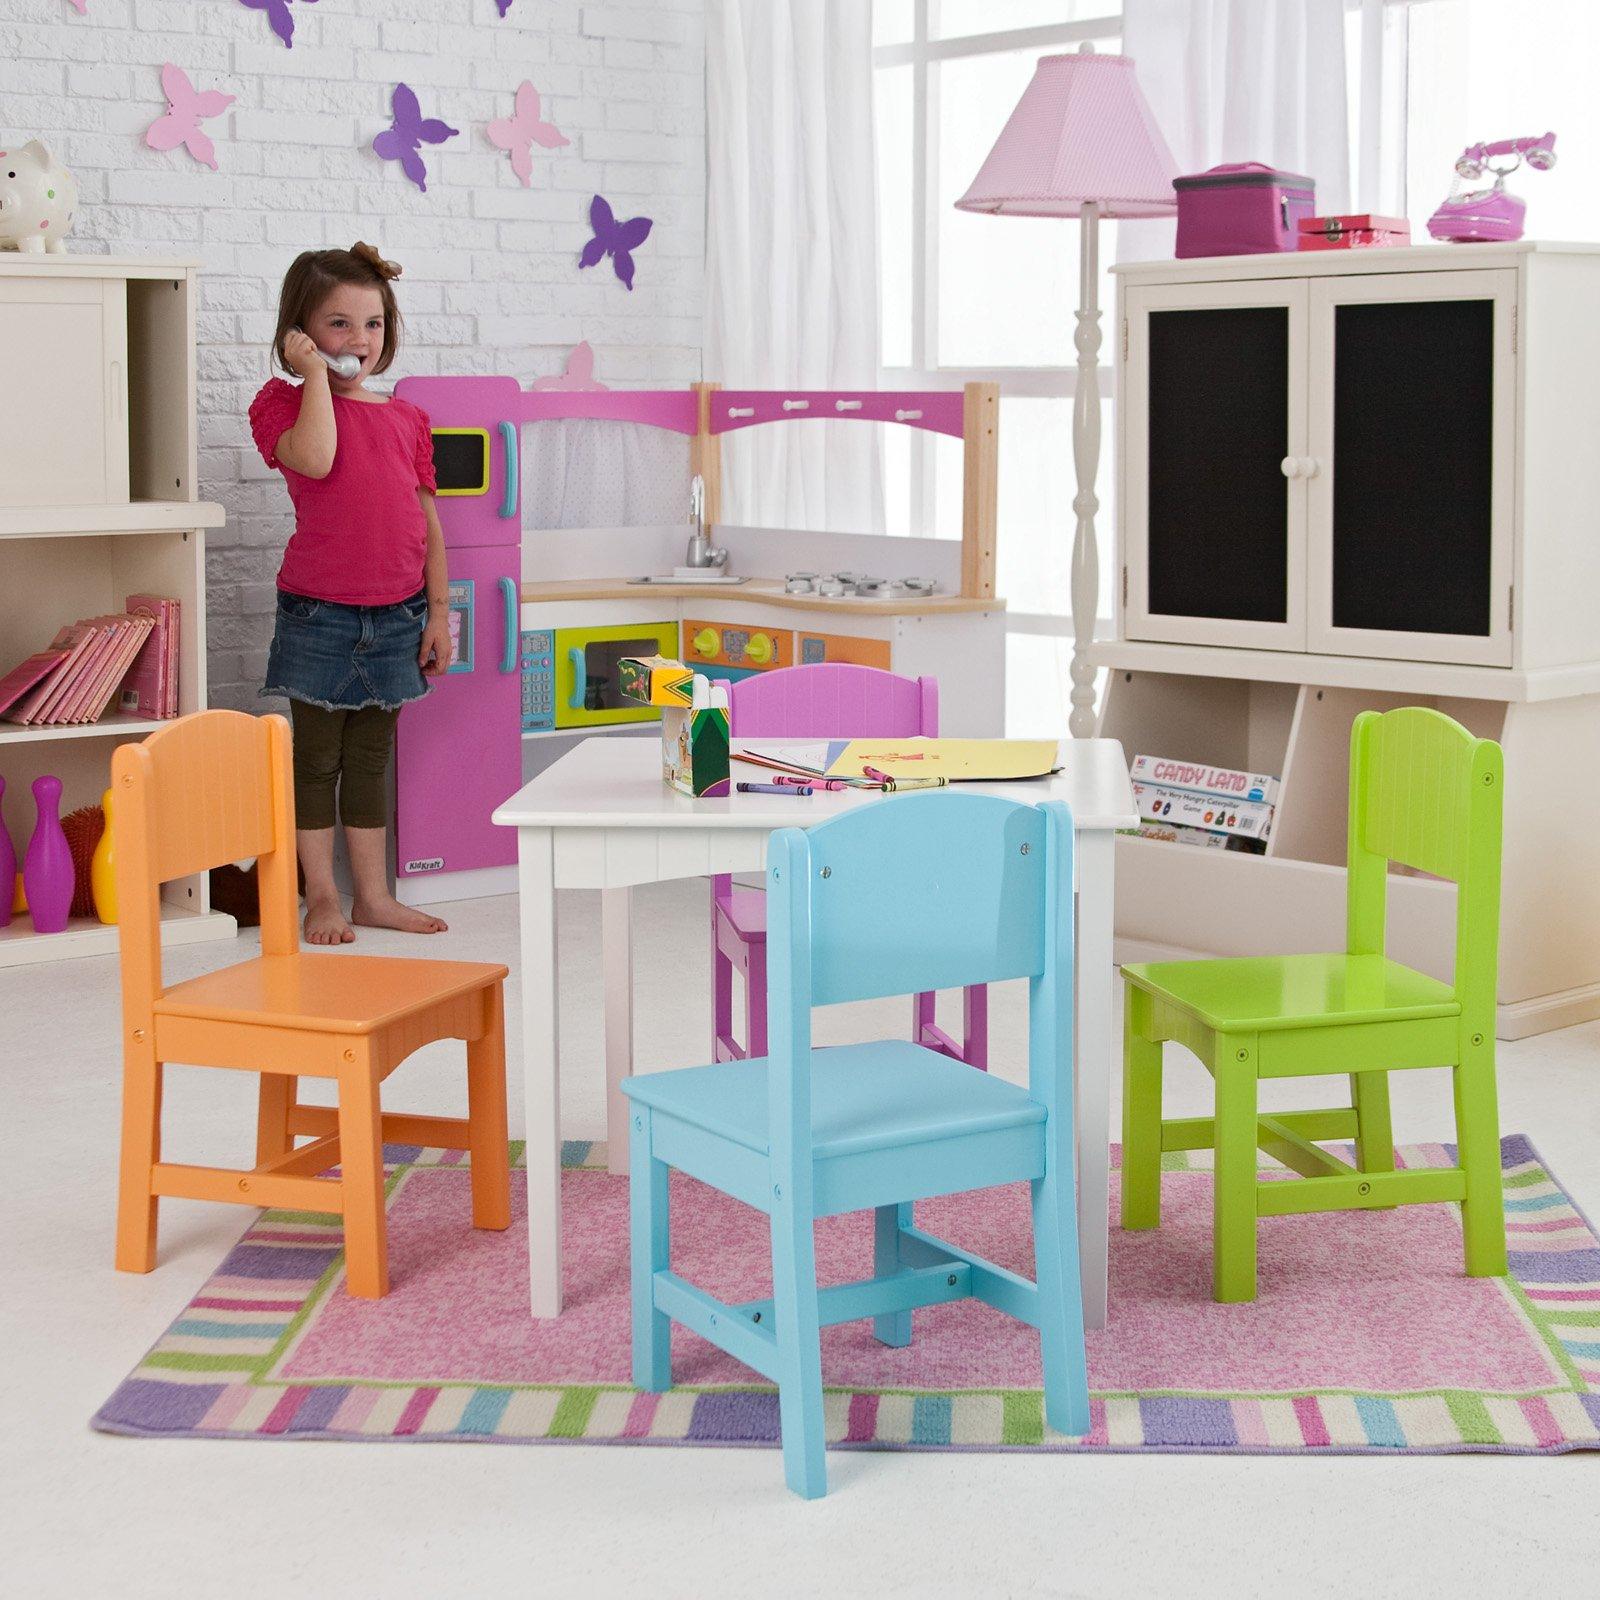 KidKraft Nantucket Big N Bright Table And Chair Set   26124   Walmart.com